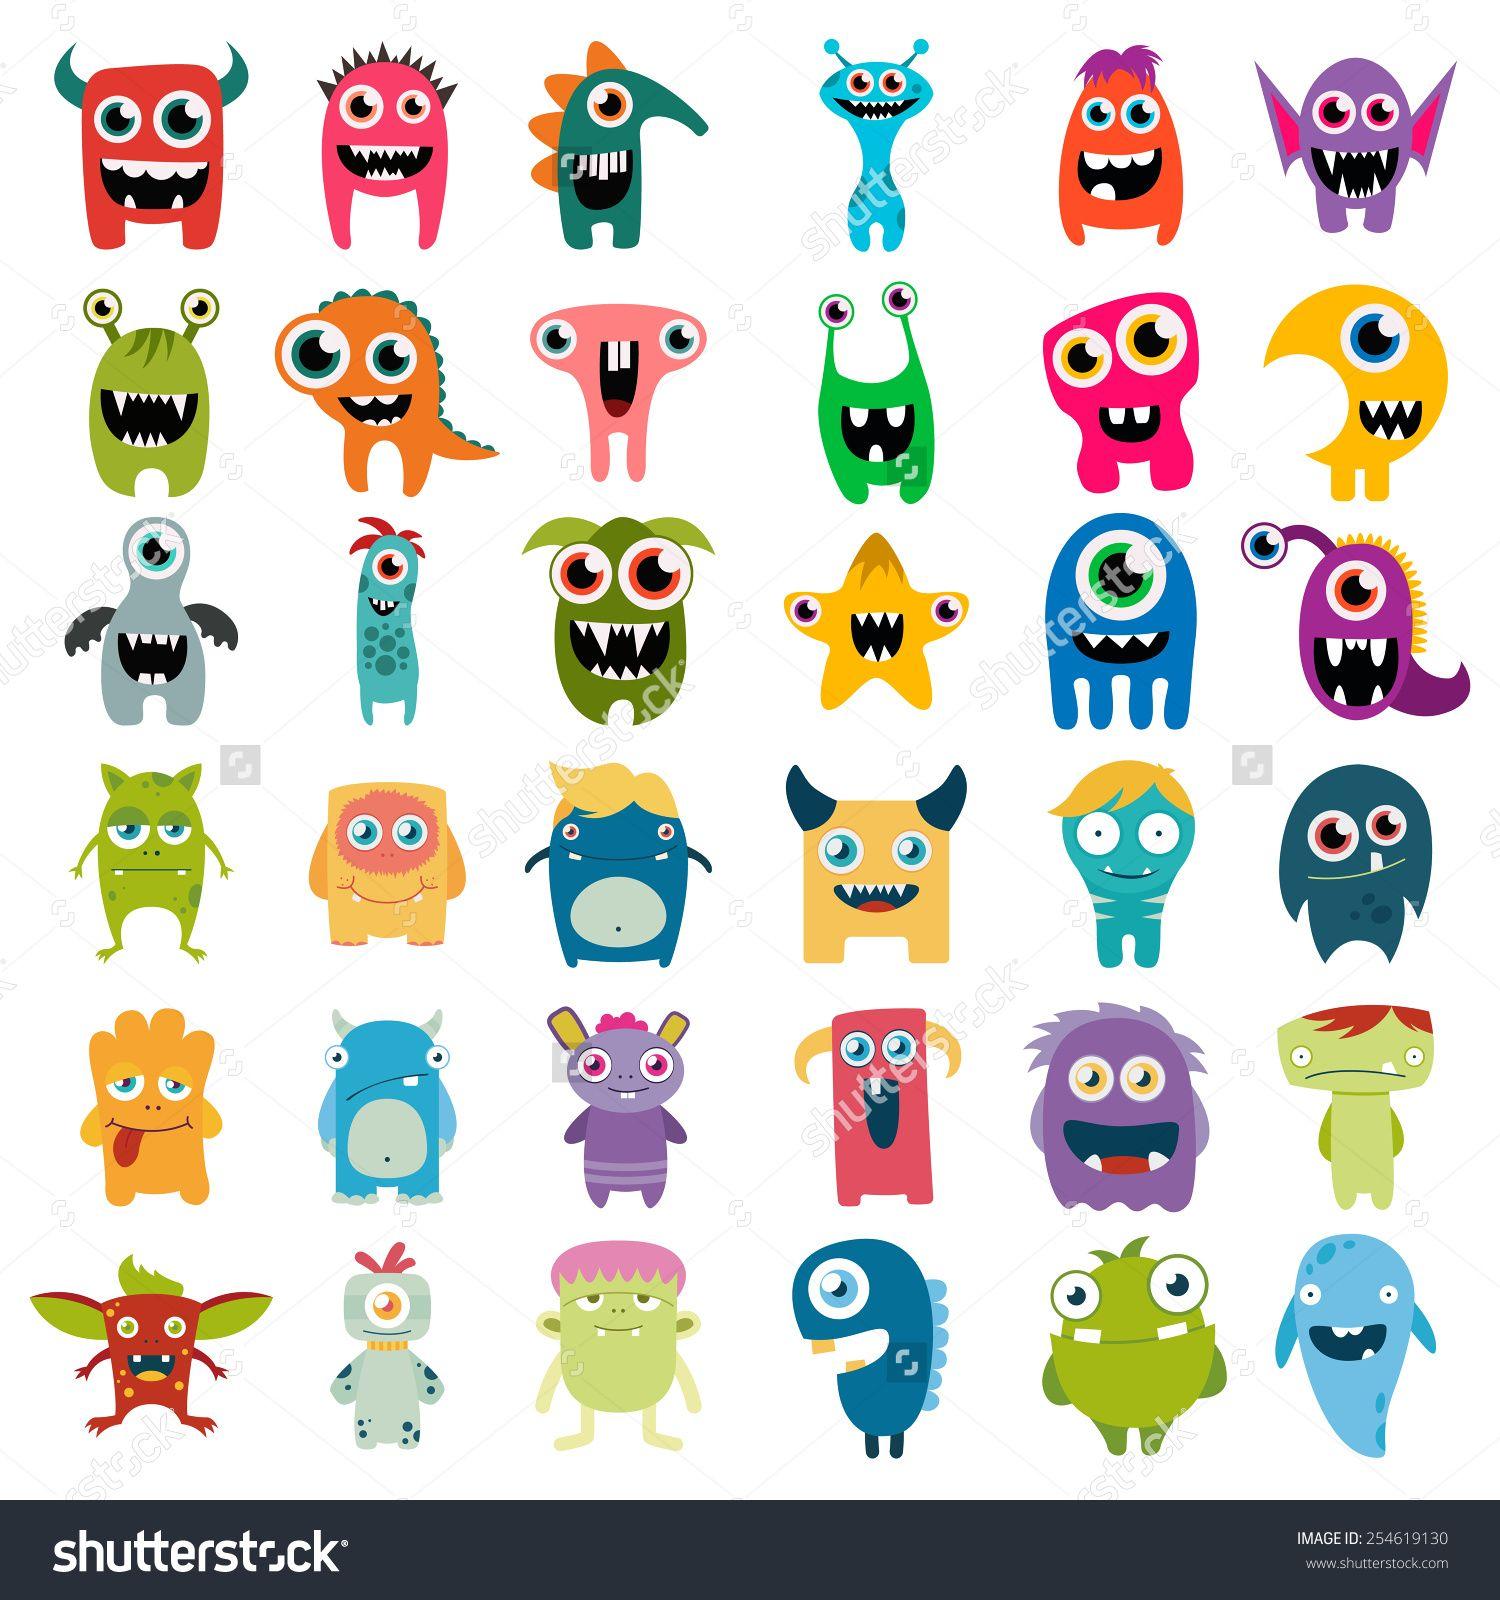 Big Vector Set Of Cartoon Cute Monsters Multiplikacionnye Risunki Monstrov Illyustracii Monstry